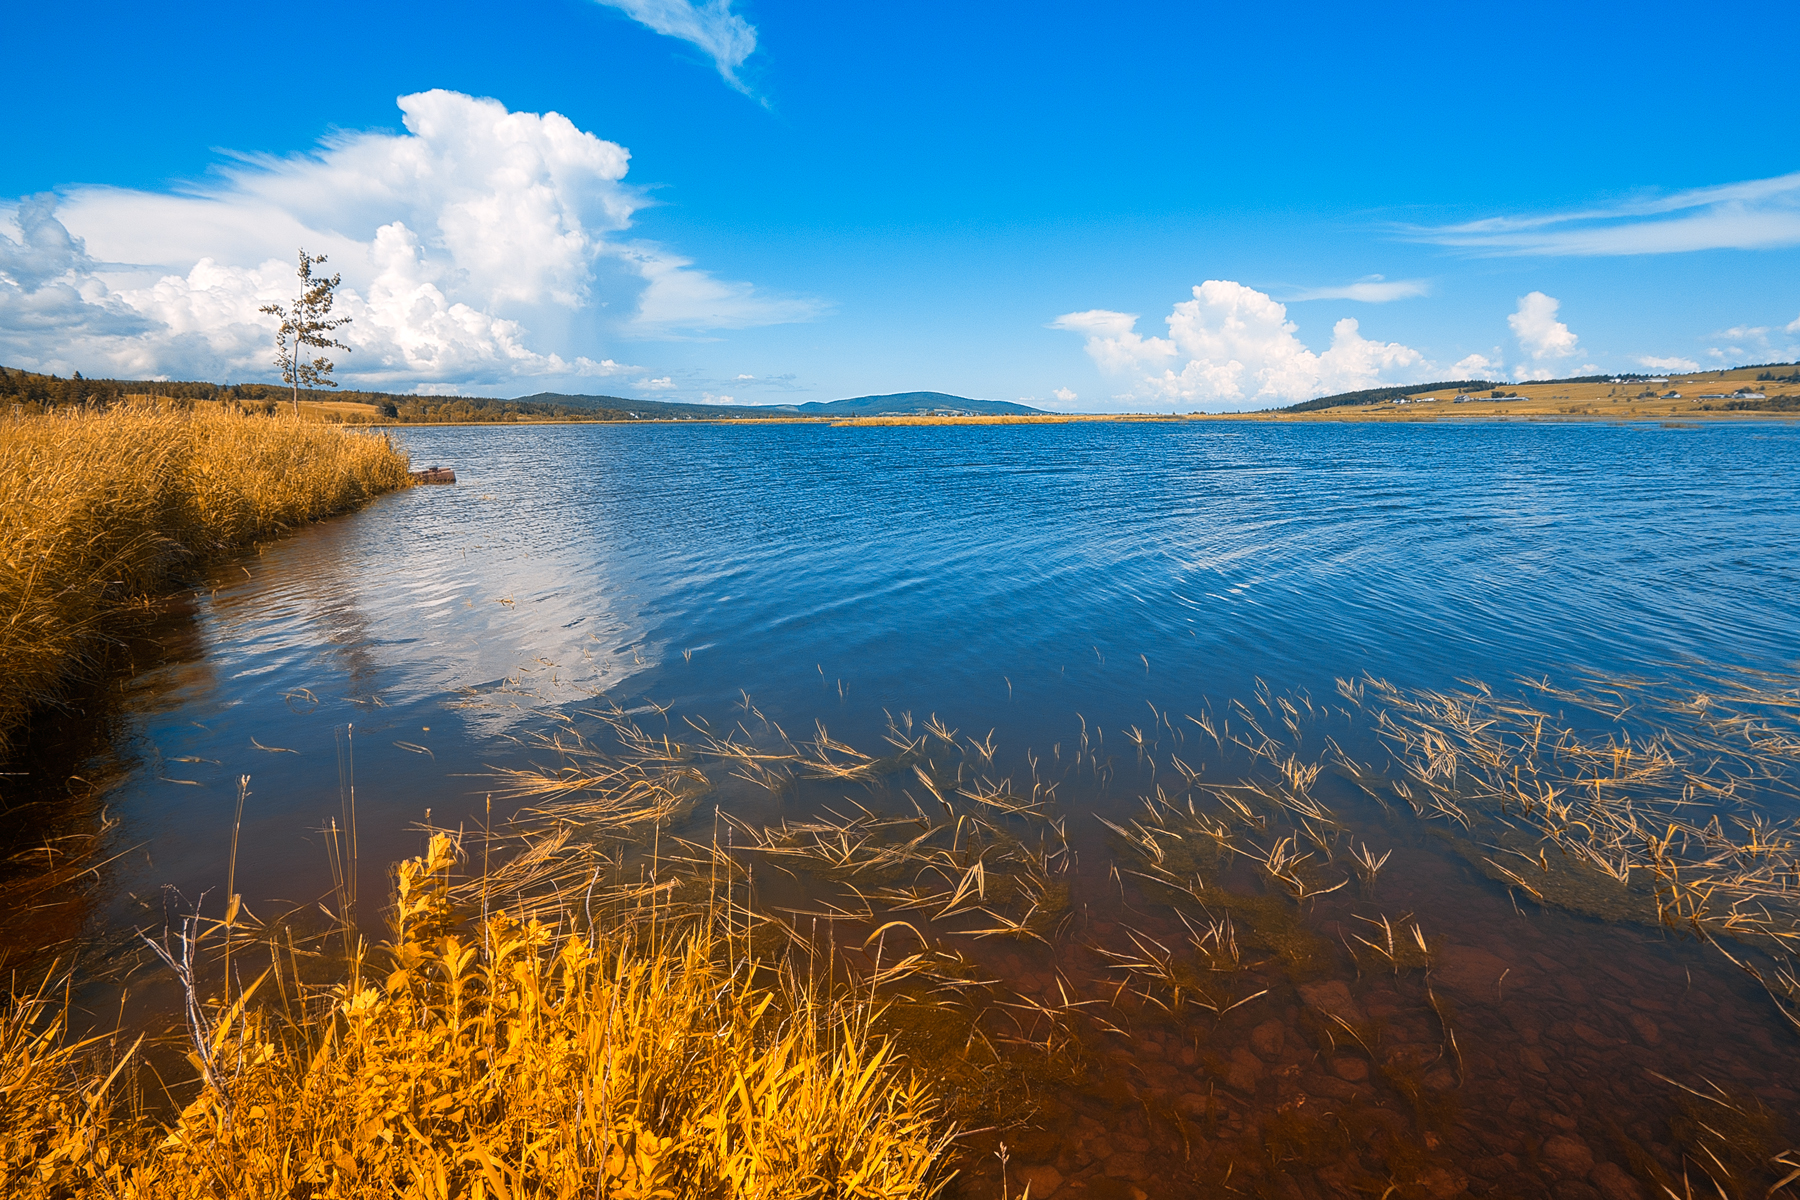 Gold beaver brook - hdr photo